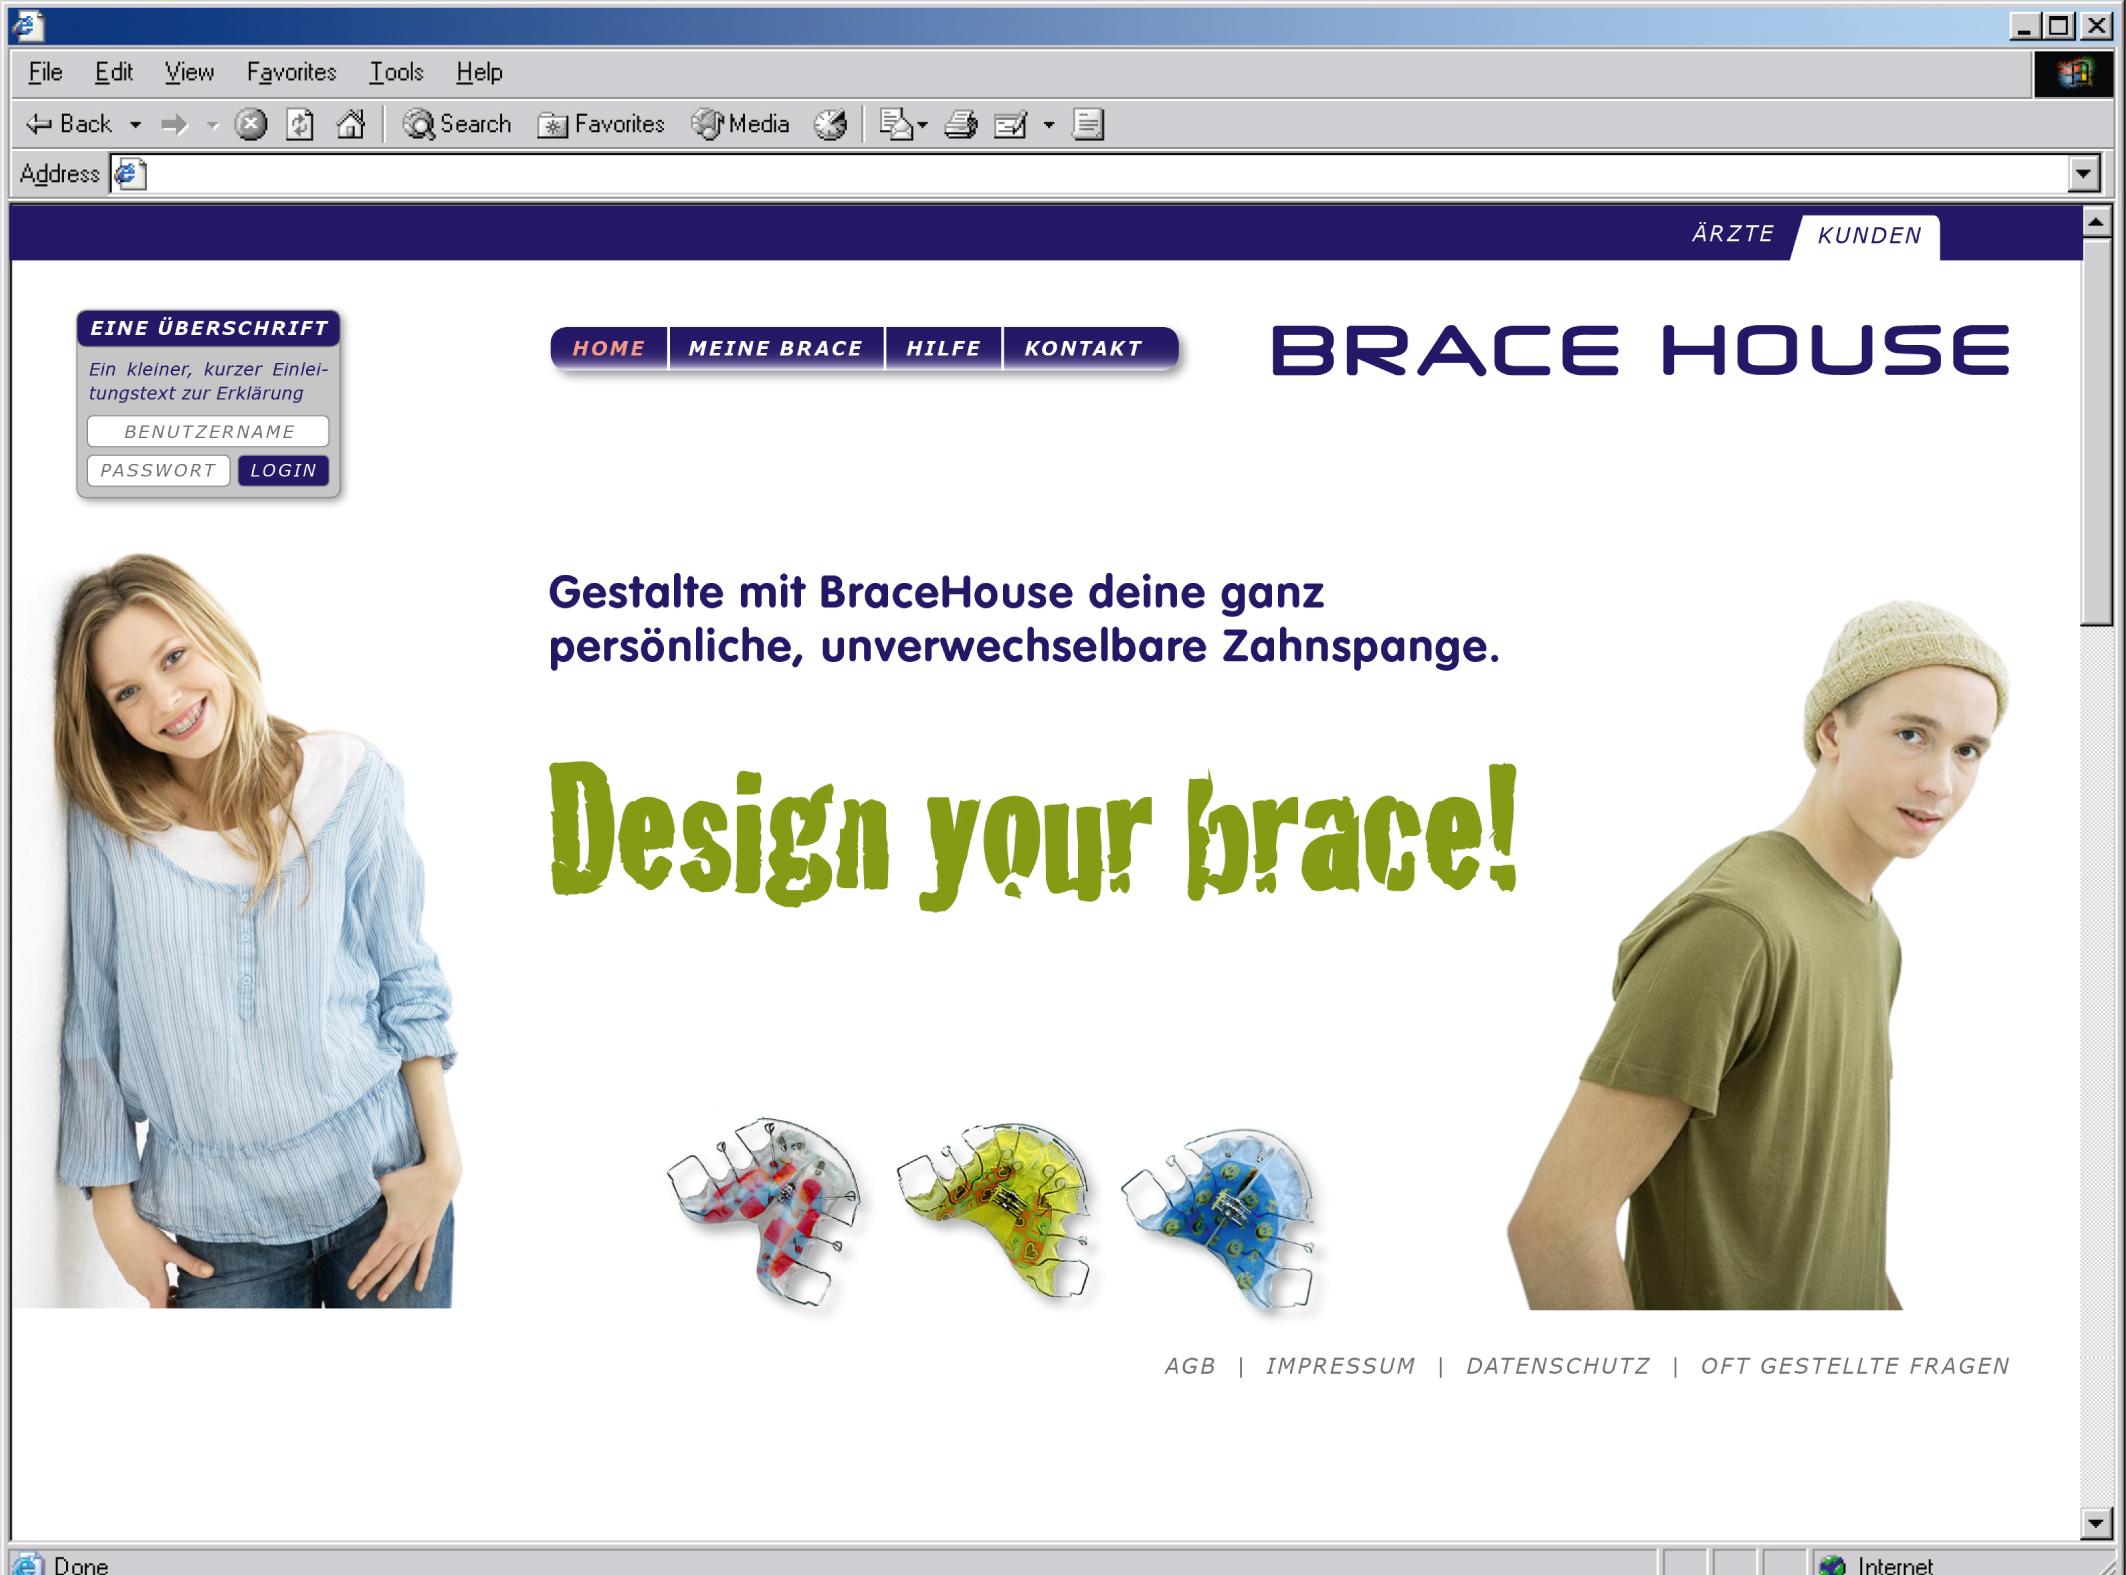 Web_Bracehouse_neue_Version_E